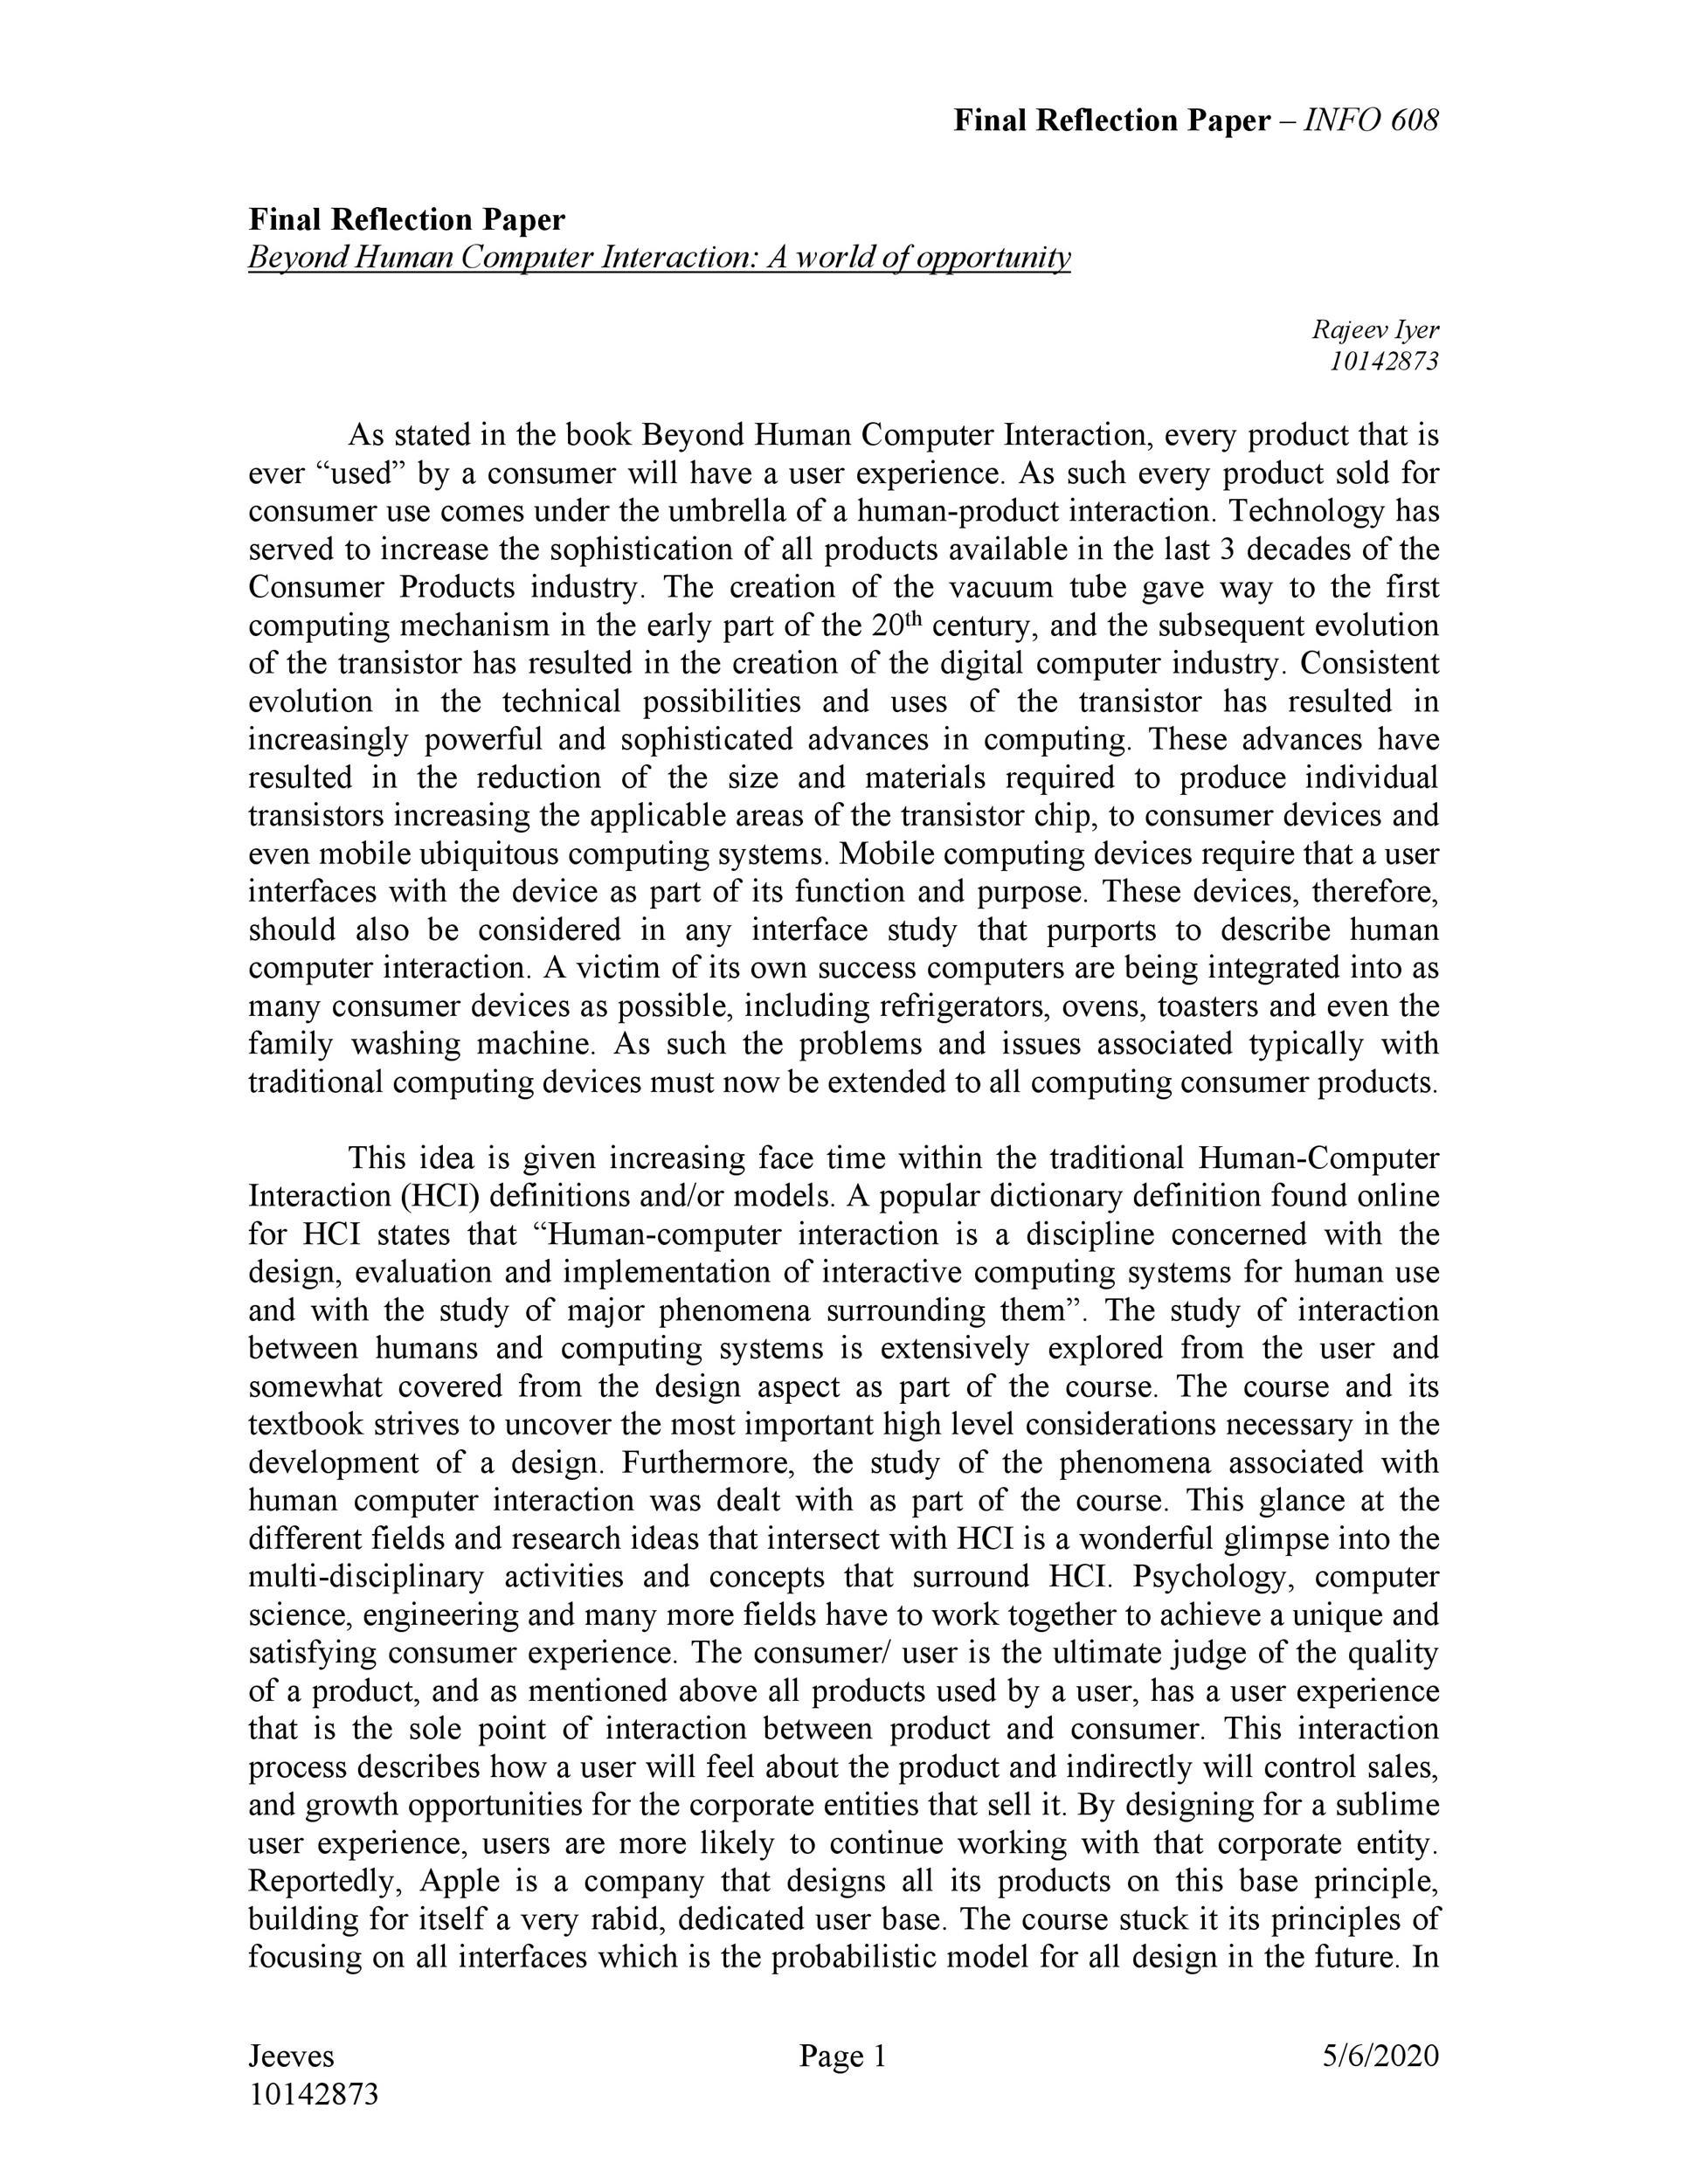 Free reflective essay example 19